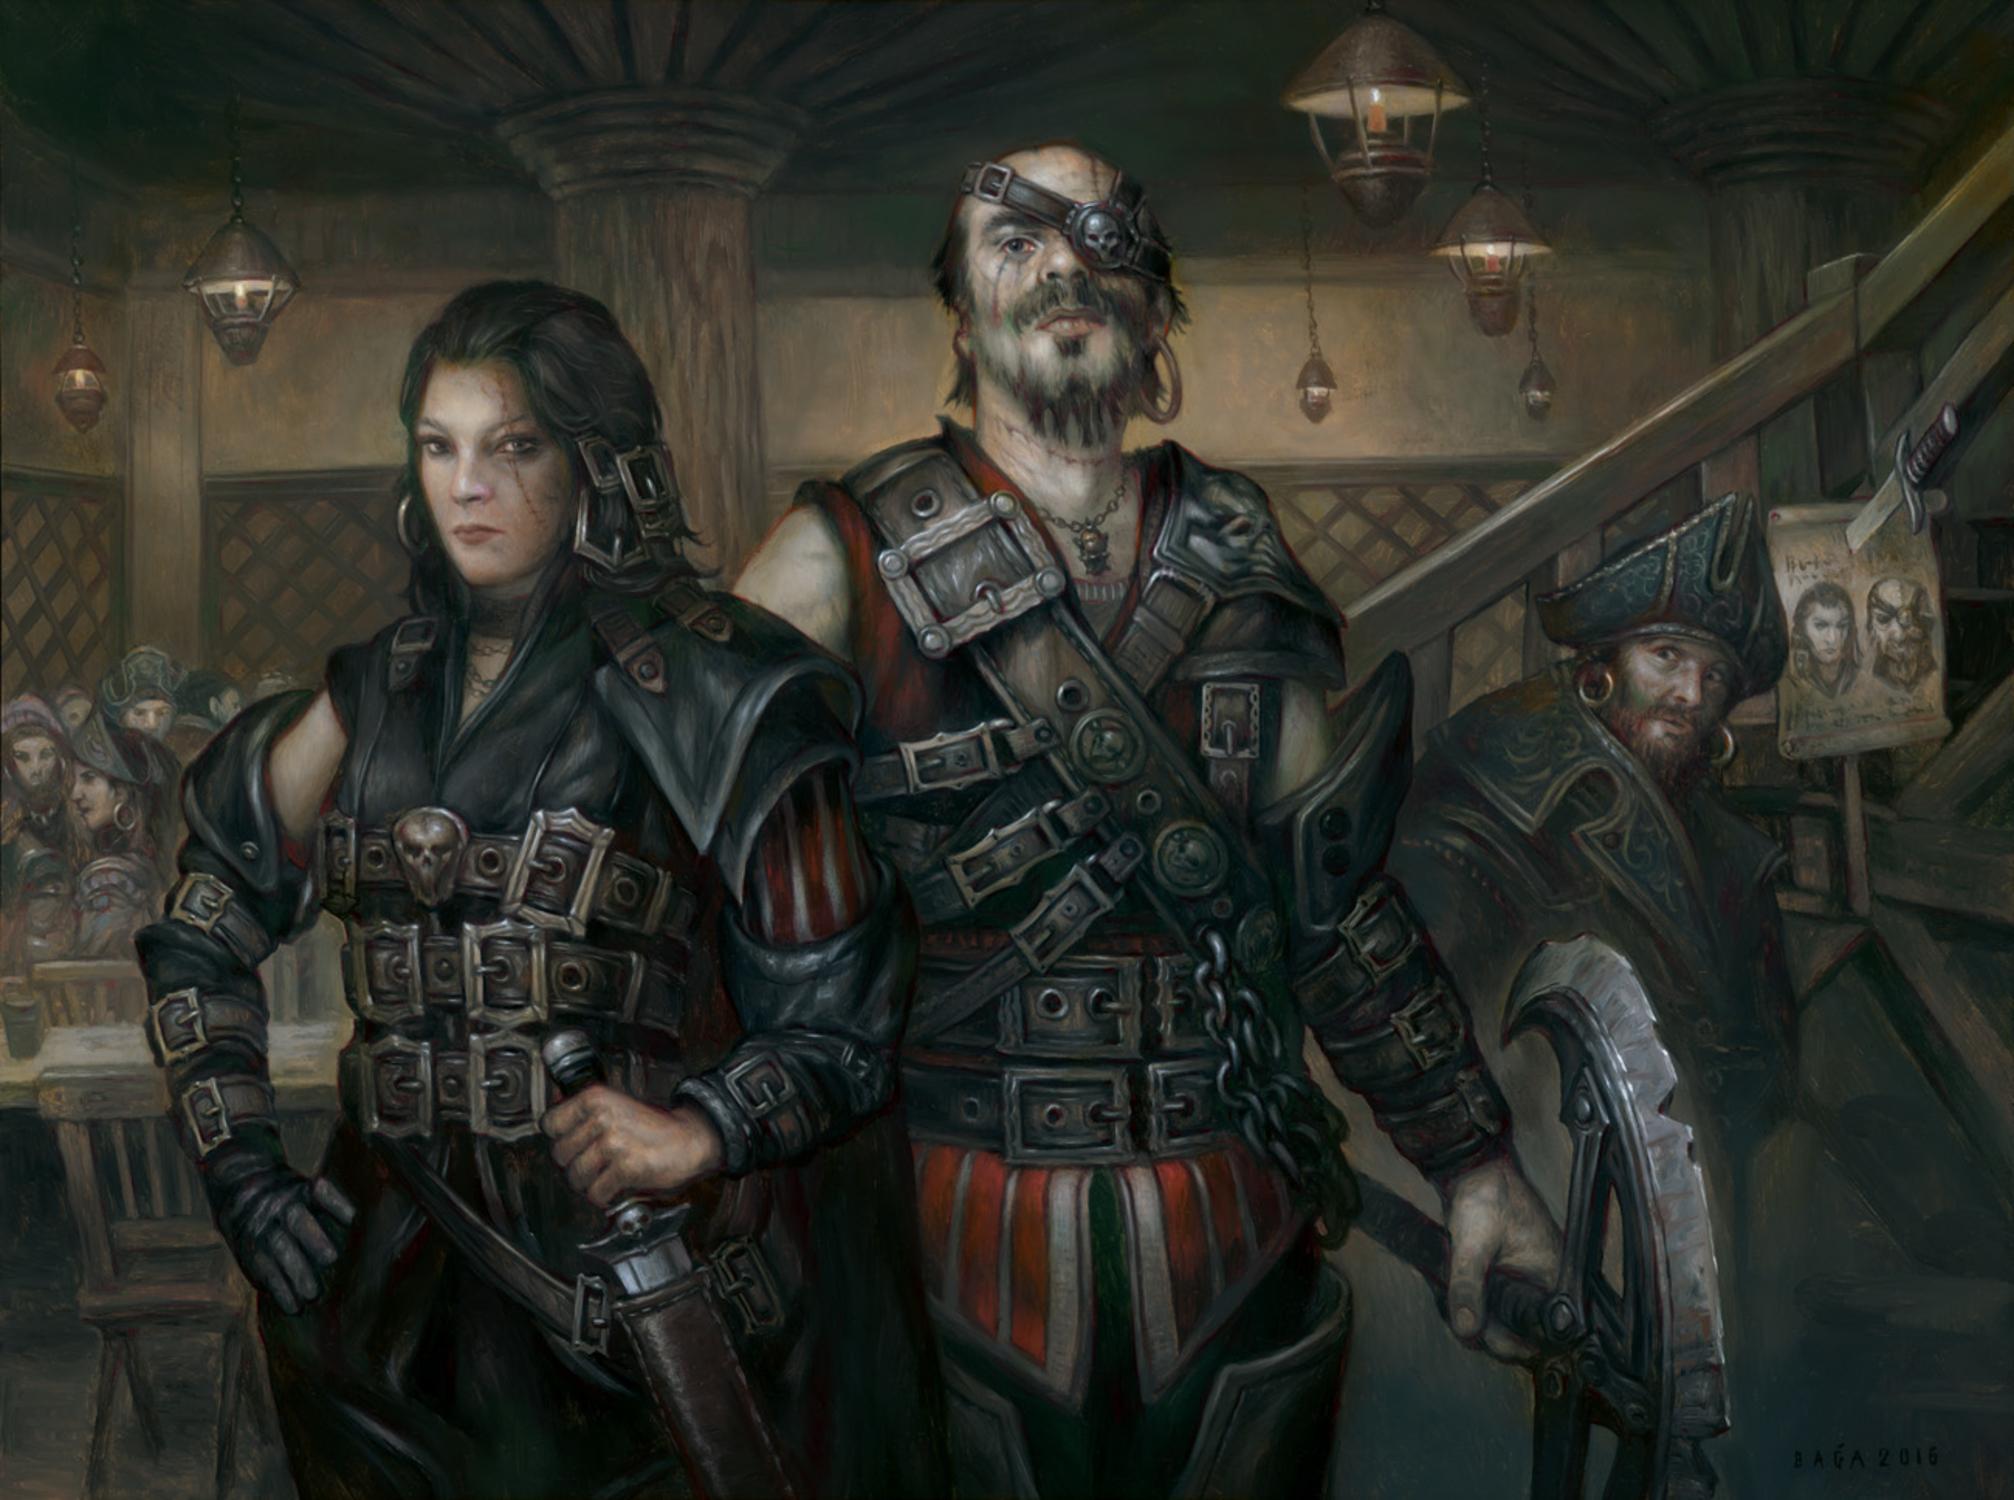 Wanted Scoundrels | Illustration by Volkan Baga